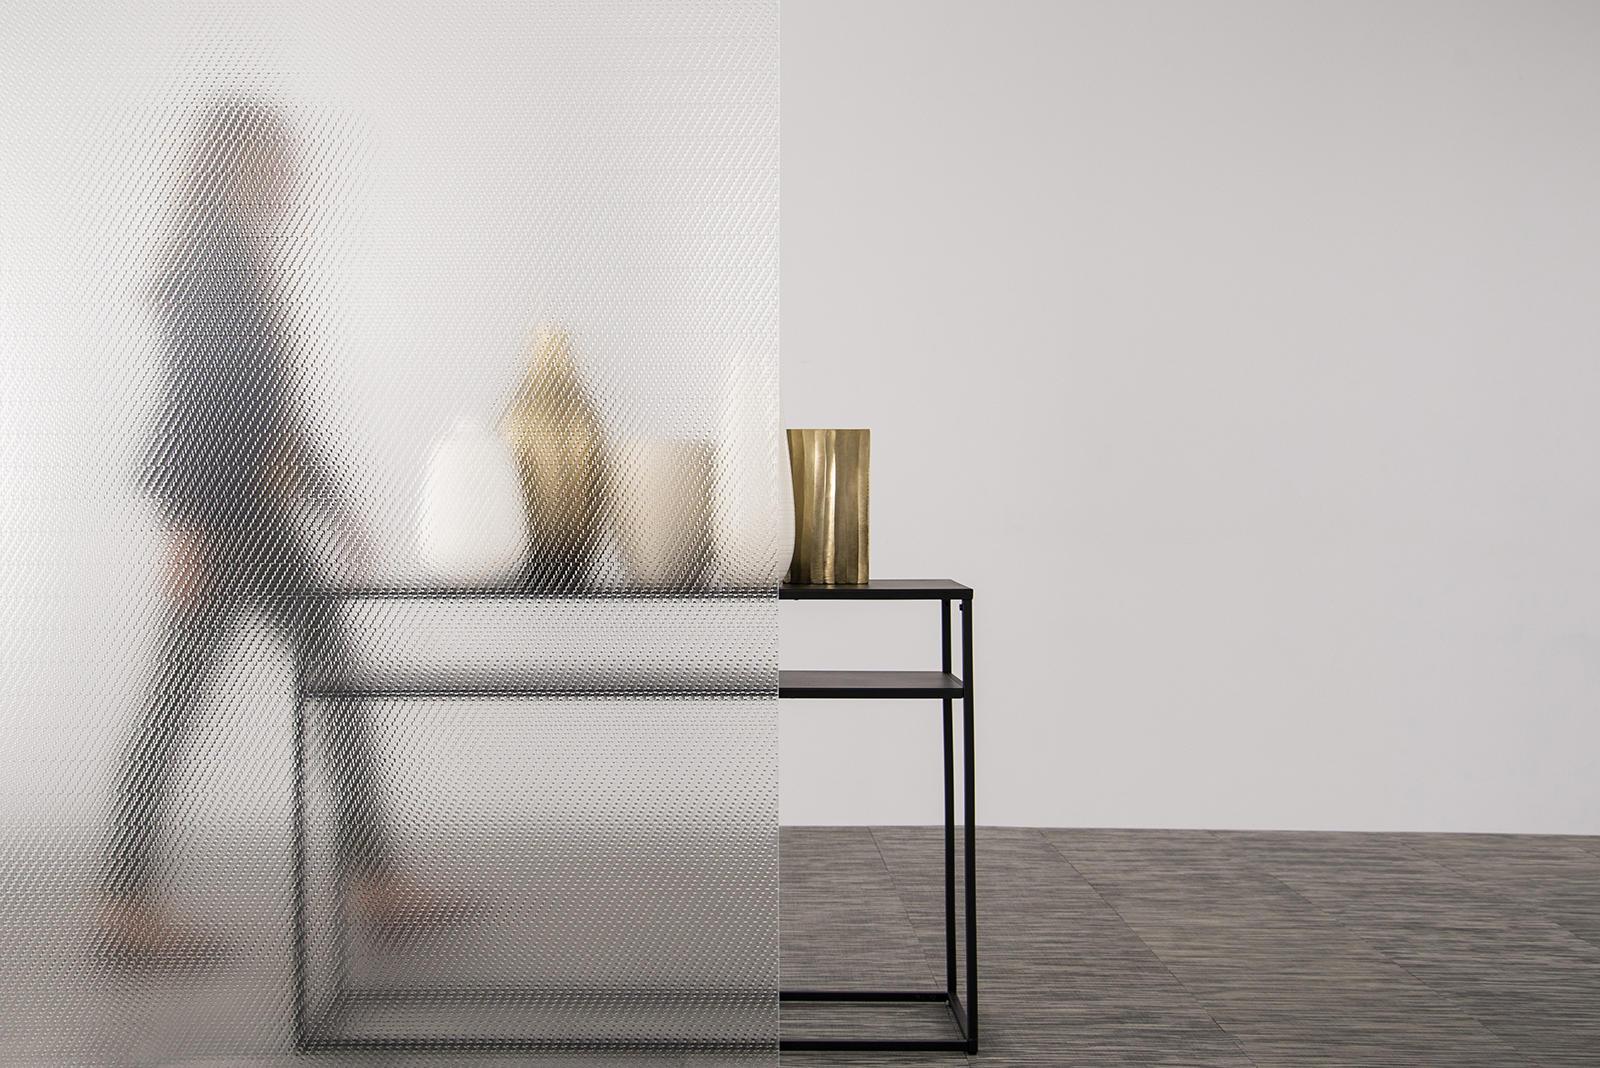 CastGlass Intervals Monolithic glass in Origin texture